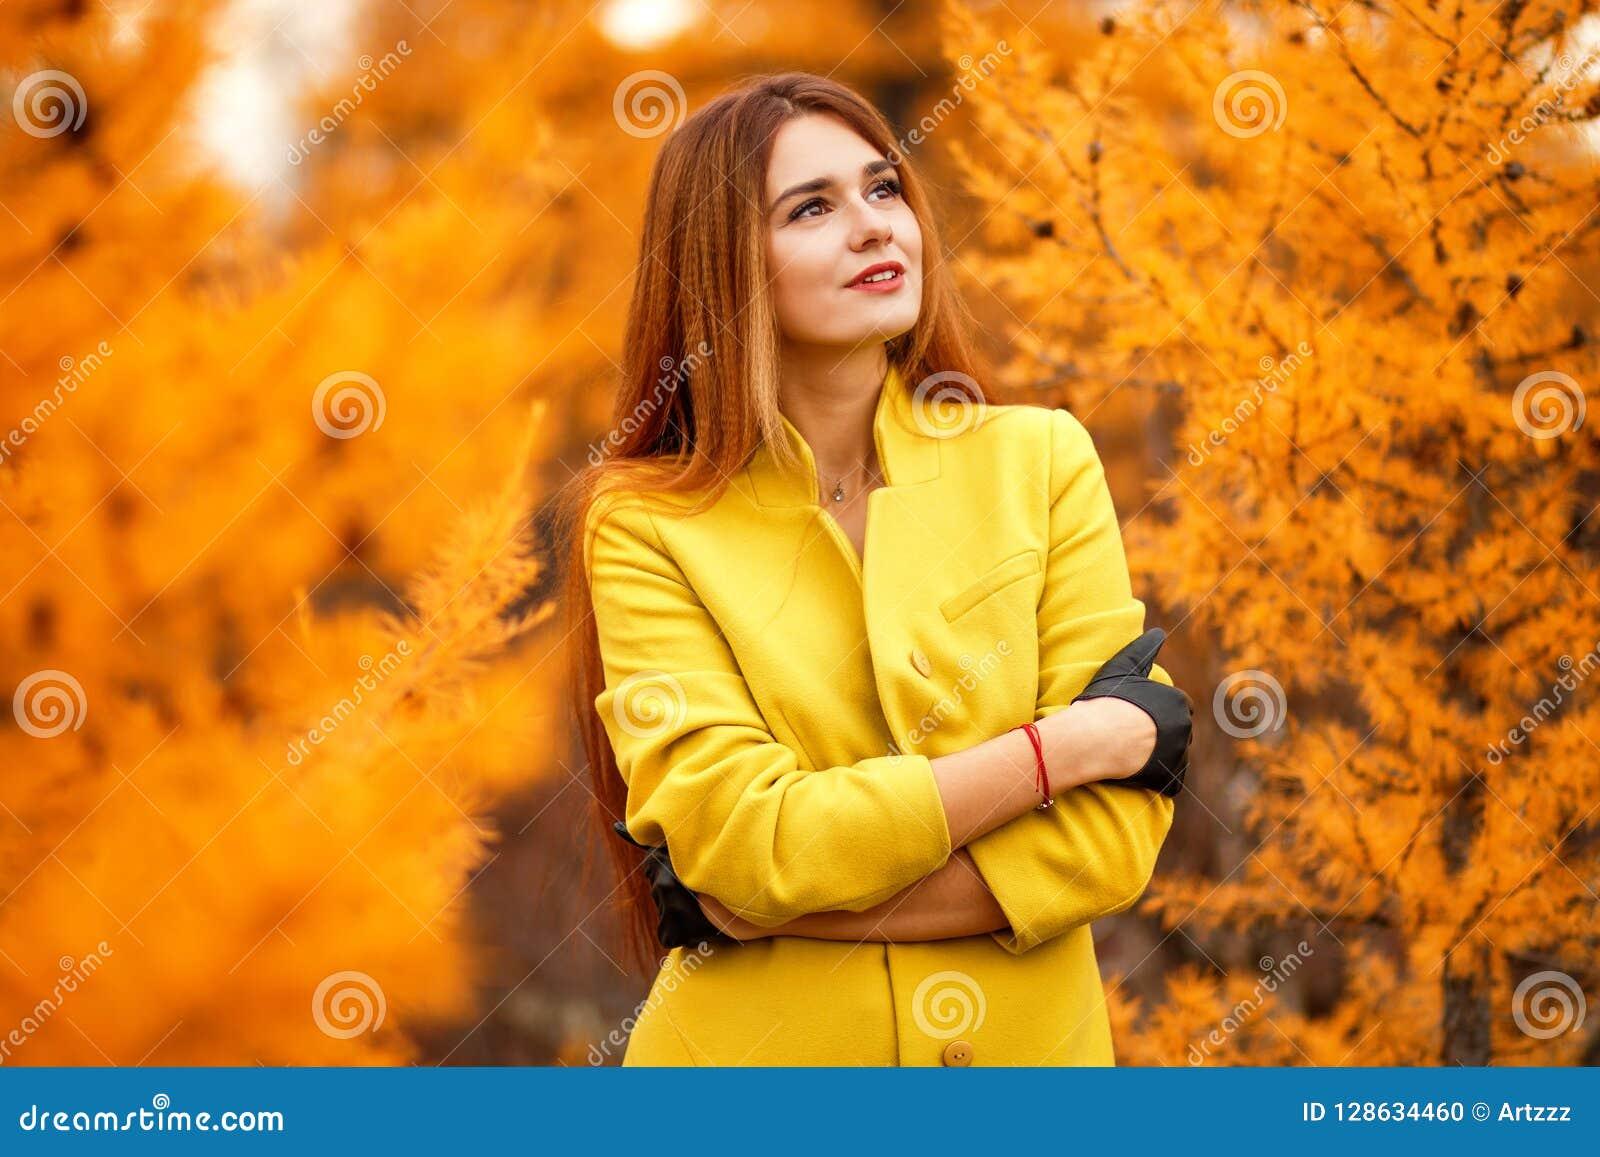 Frau in einem Herbstwald